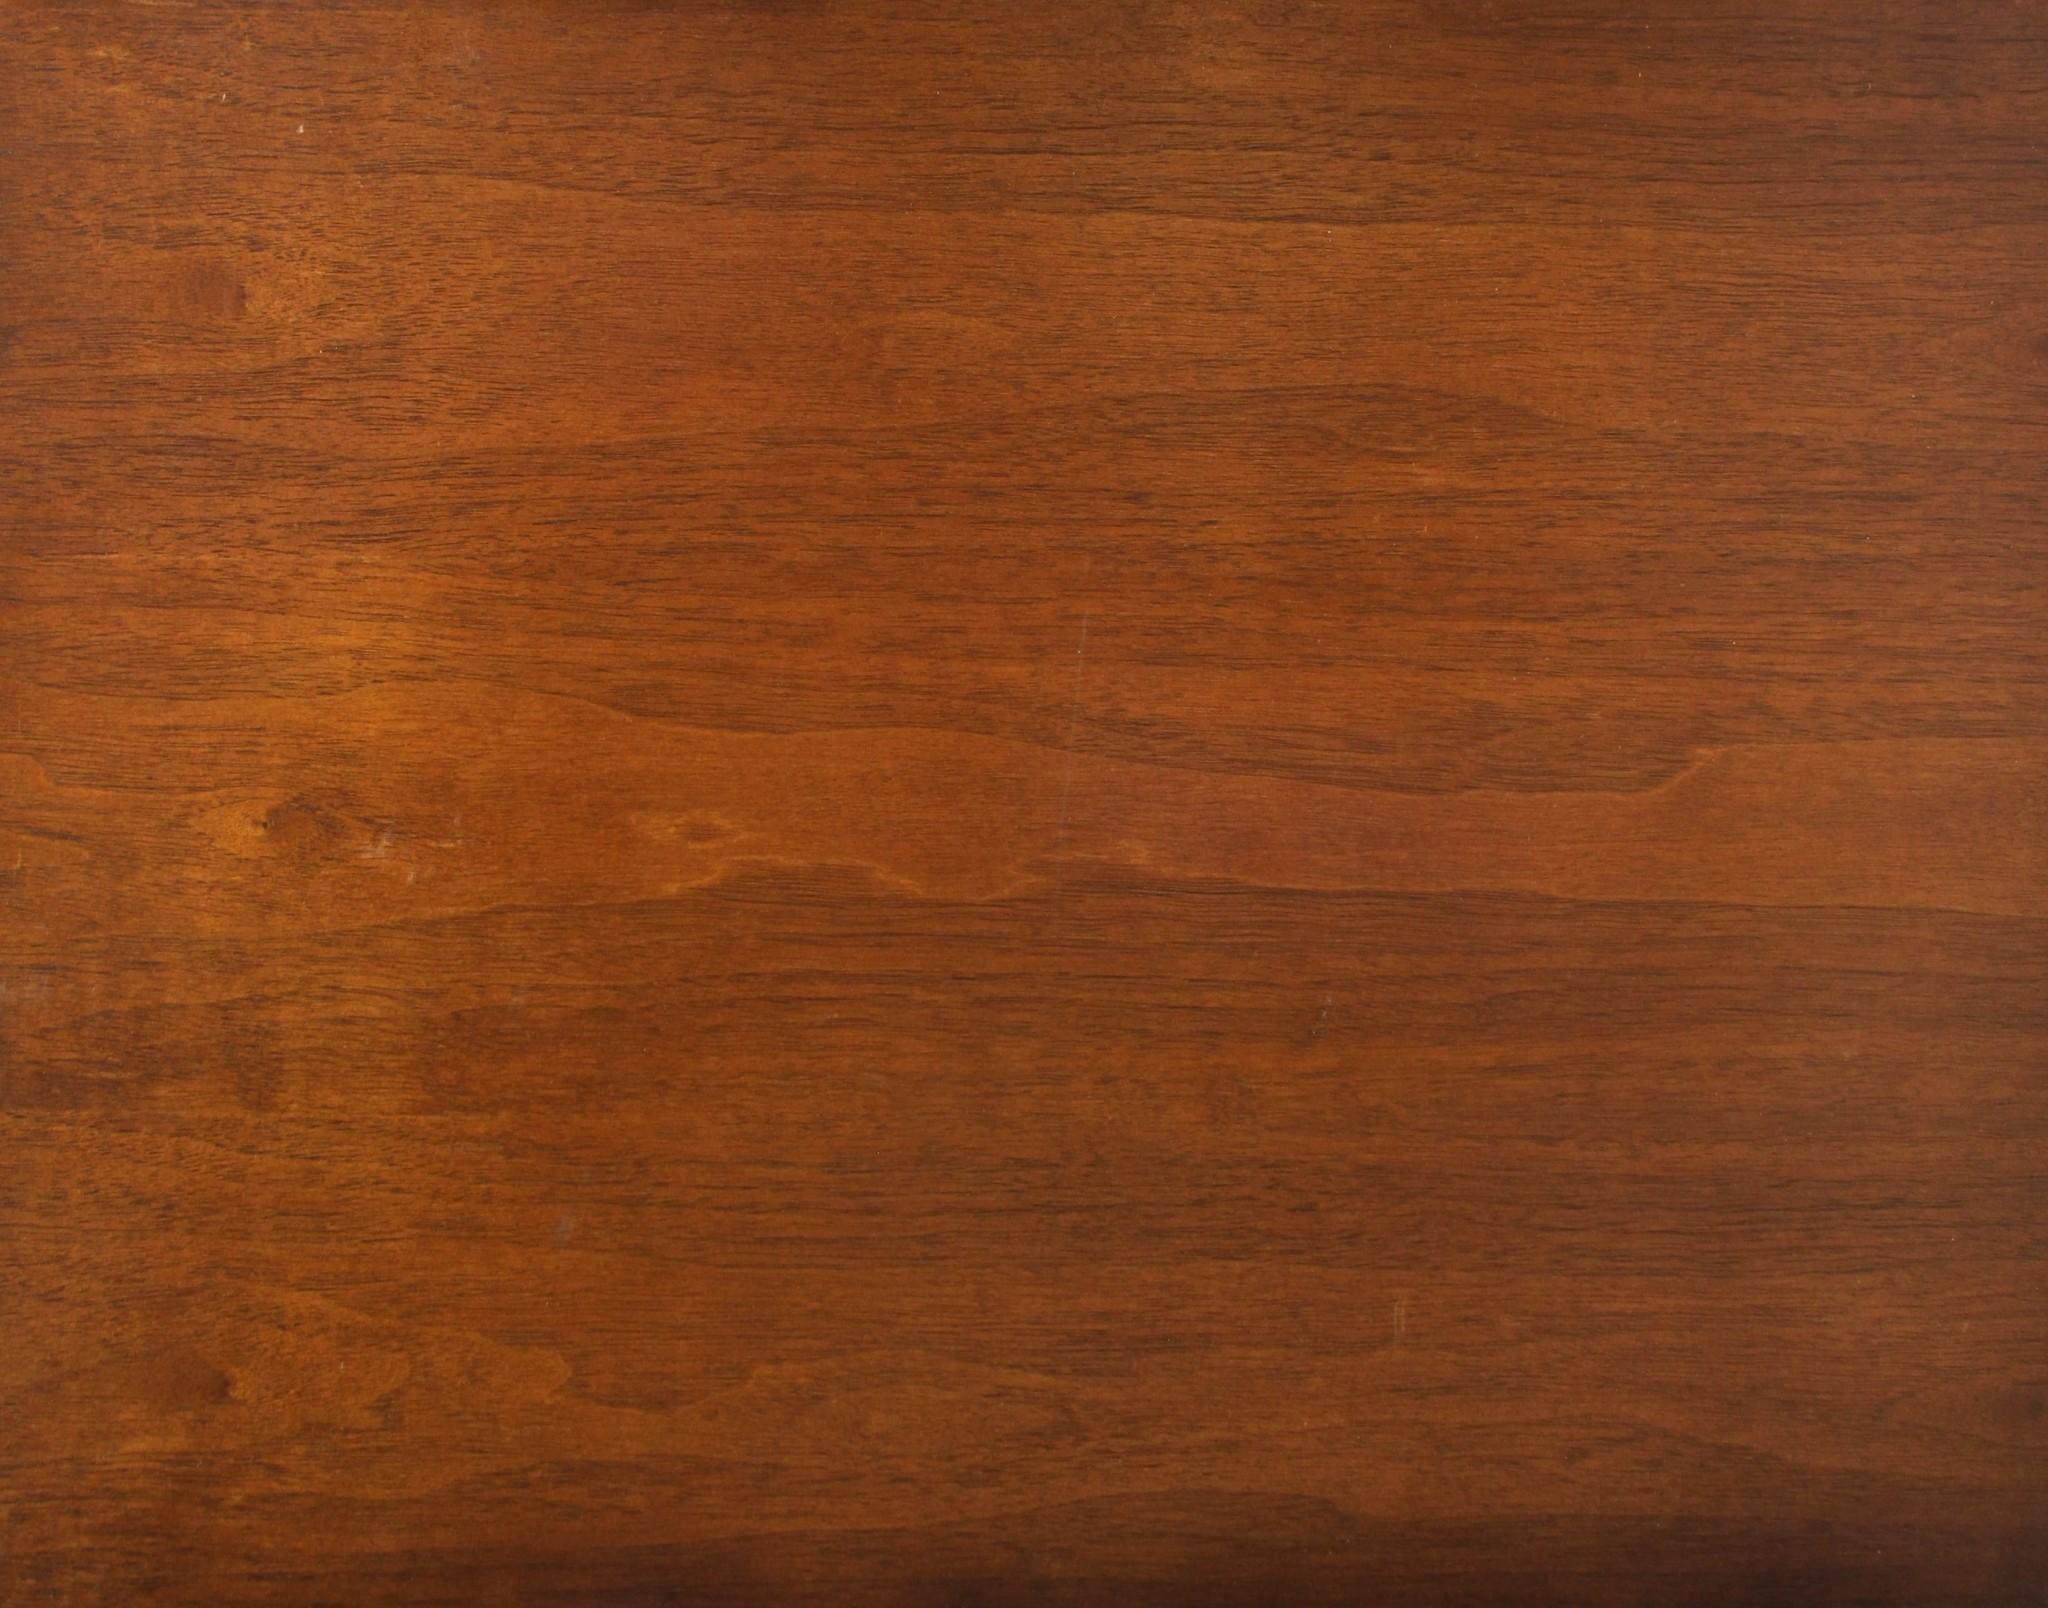 wood wallpaper free